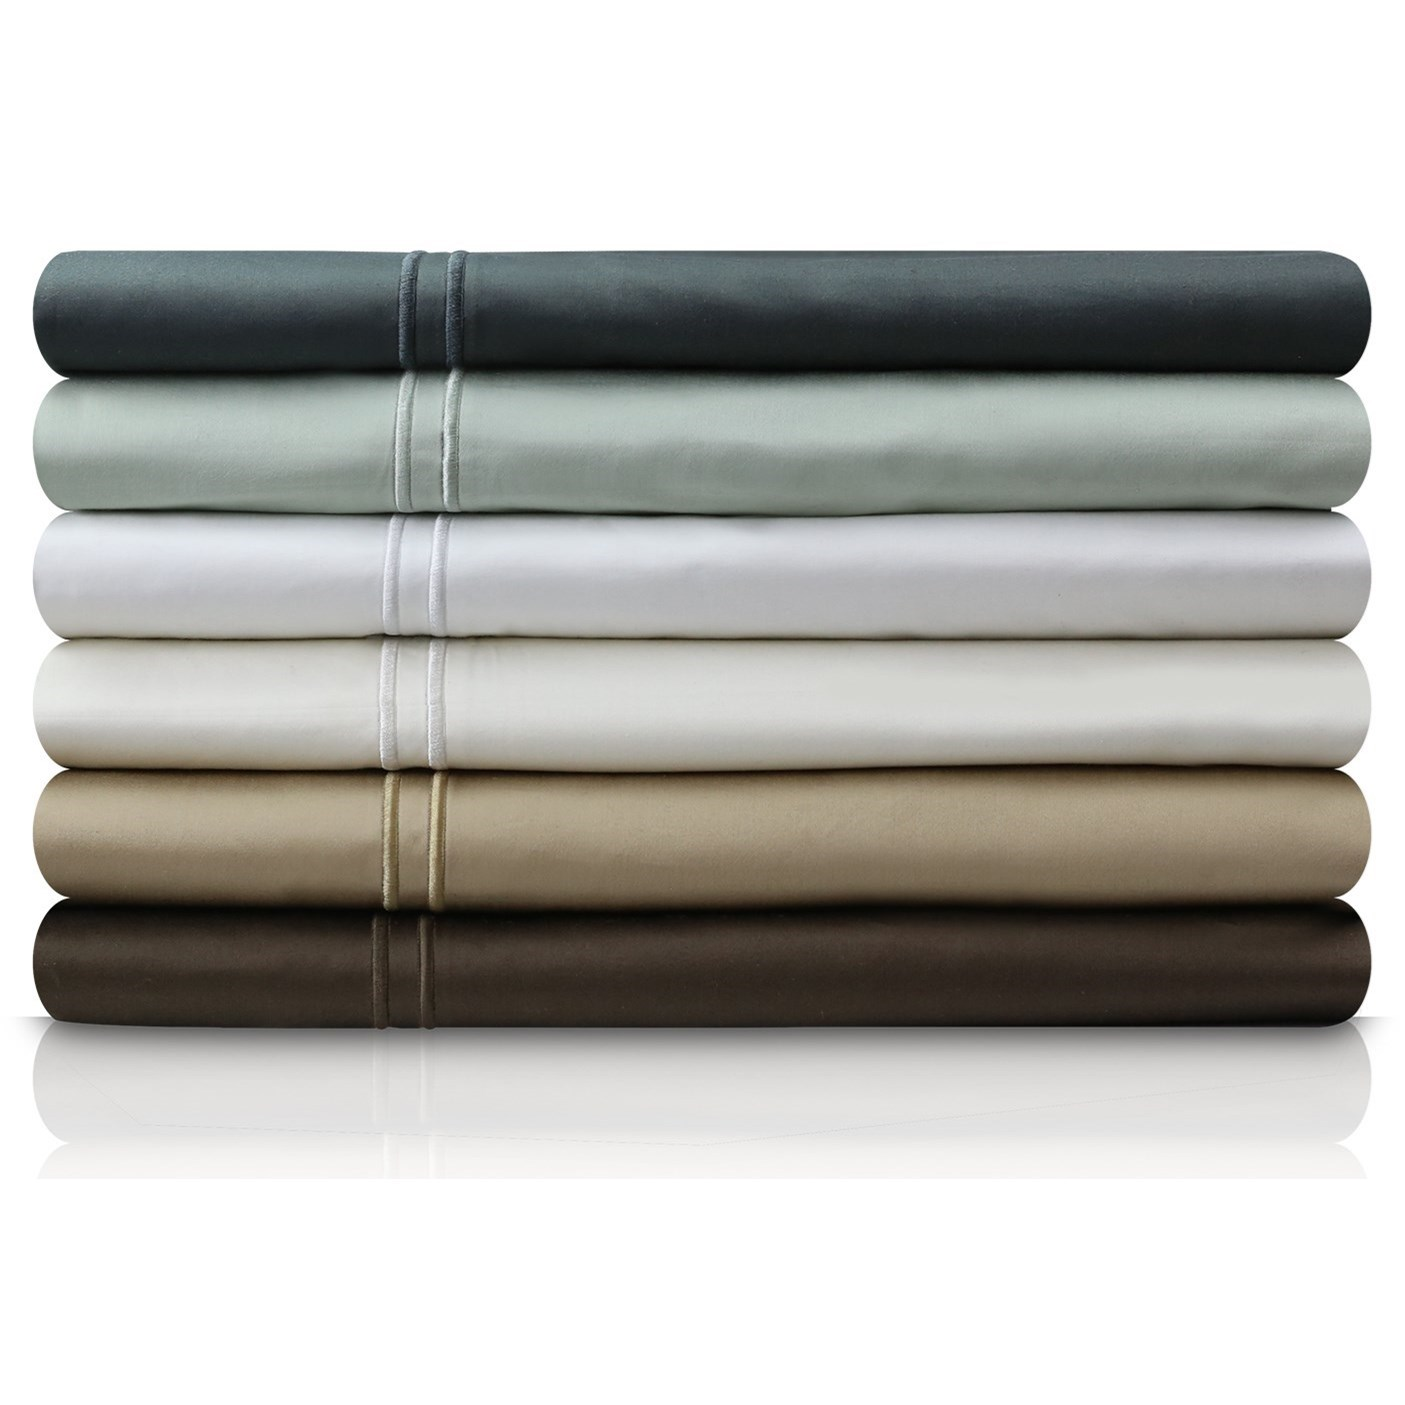 Malouf Egyptian Cotton Queen 600 TC Egyptian Cotton Pillowcases  - Item Number: MA06QQKHPC